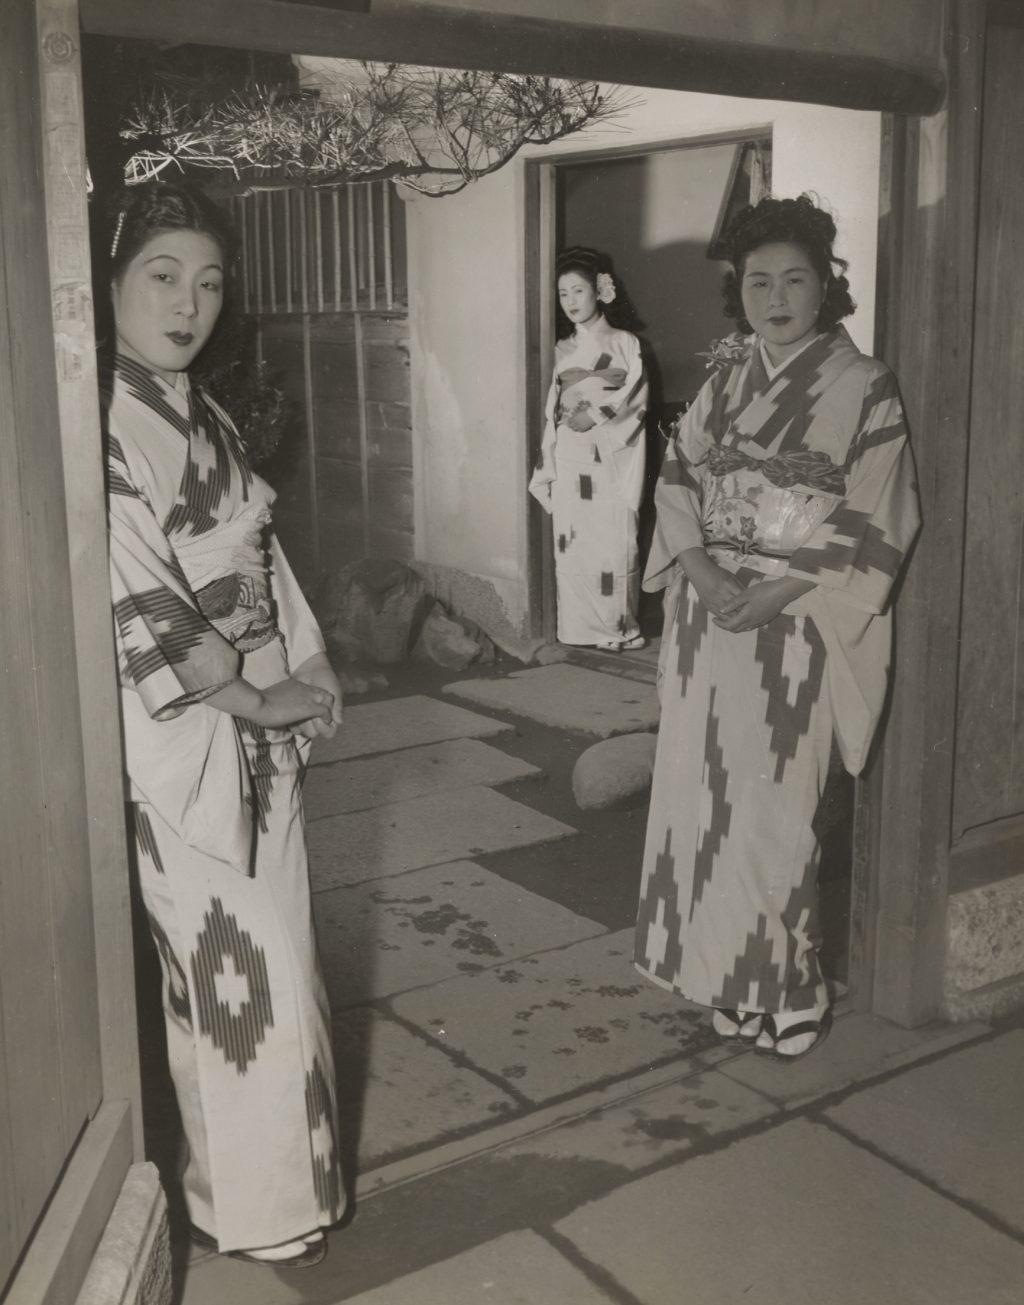 Room Hiroshima Japan In Brothels